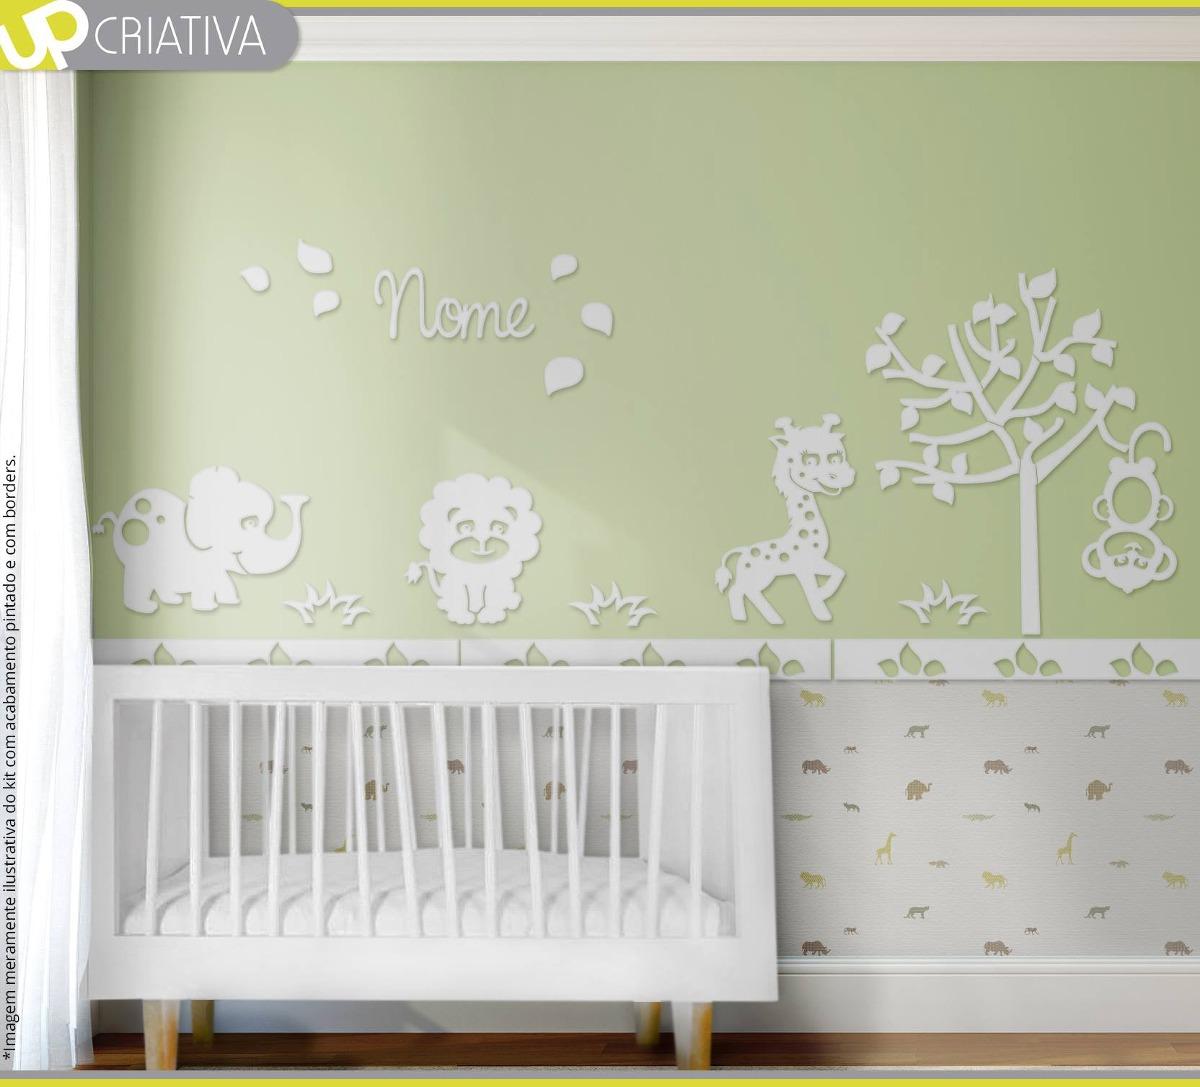 Painel Safari Para Quarto Beb Completa Em Mdf Pintado R 297 99  ~ Quarto De Bebê Safari E Quarto De Bebe Criativo